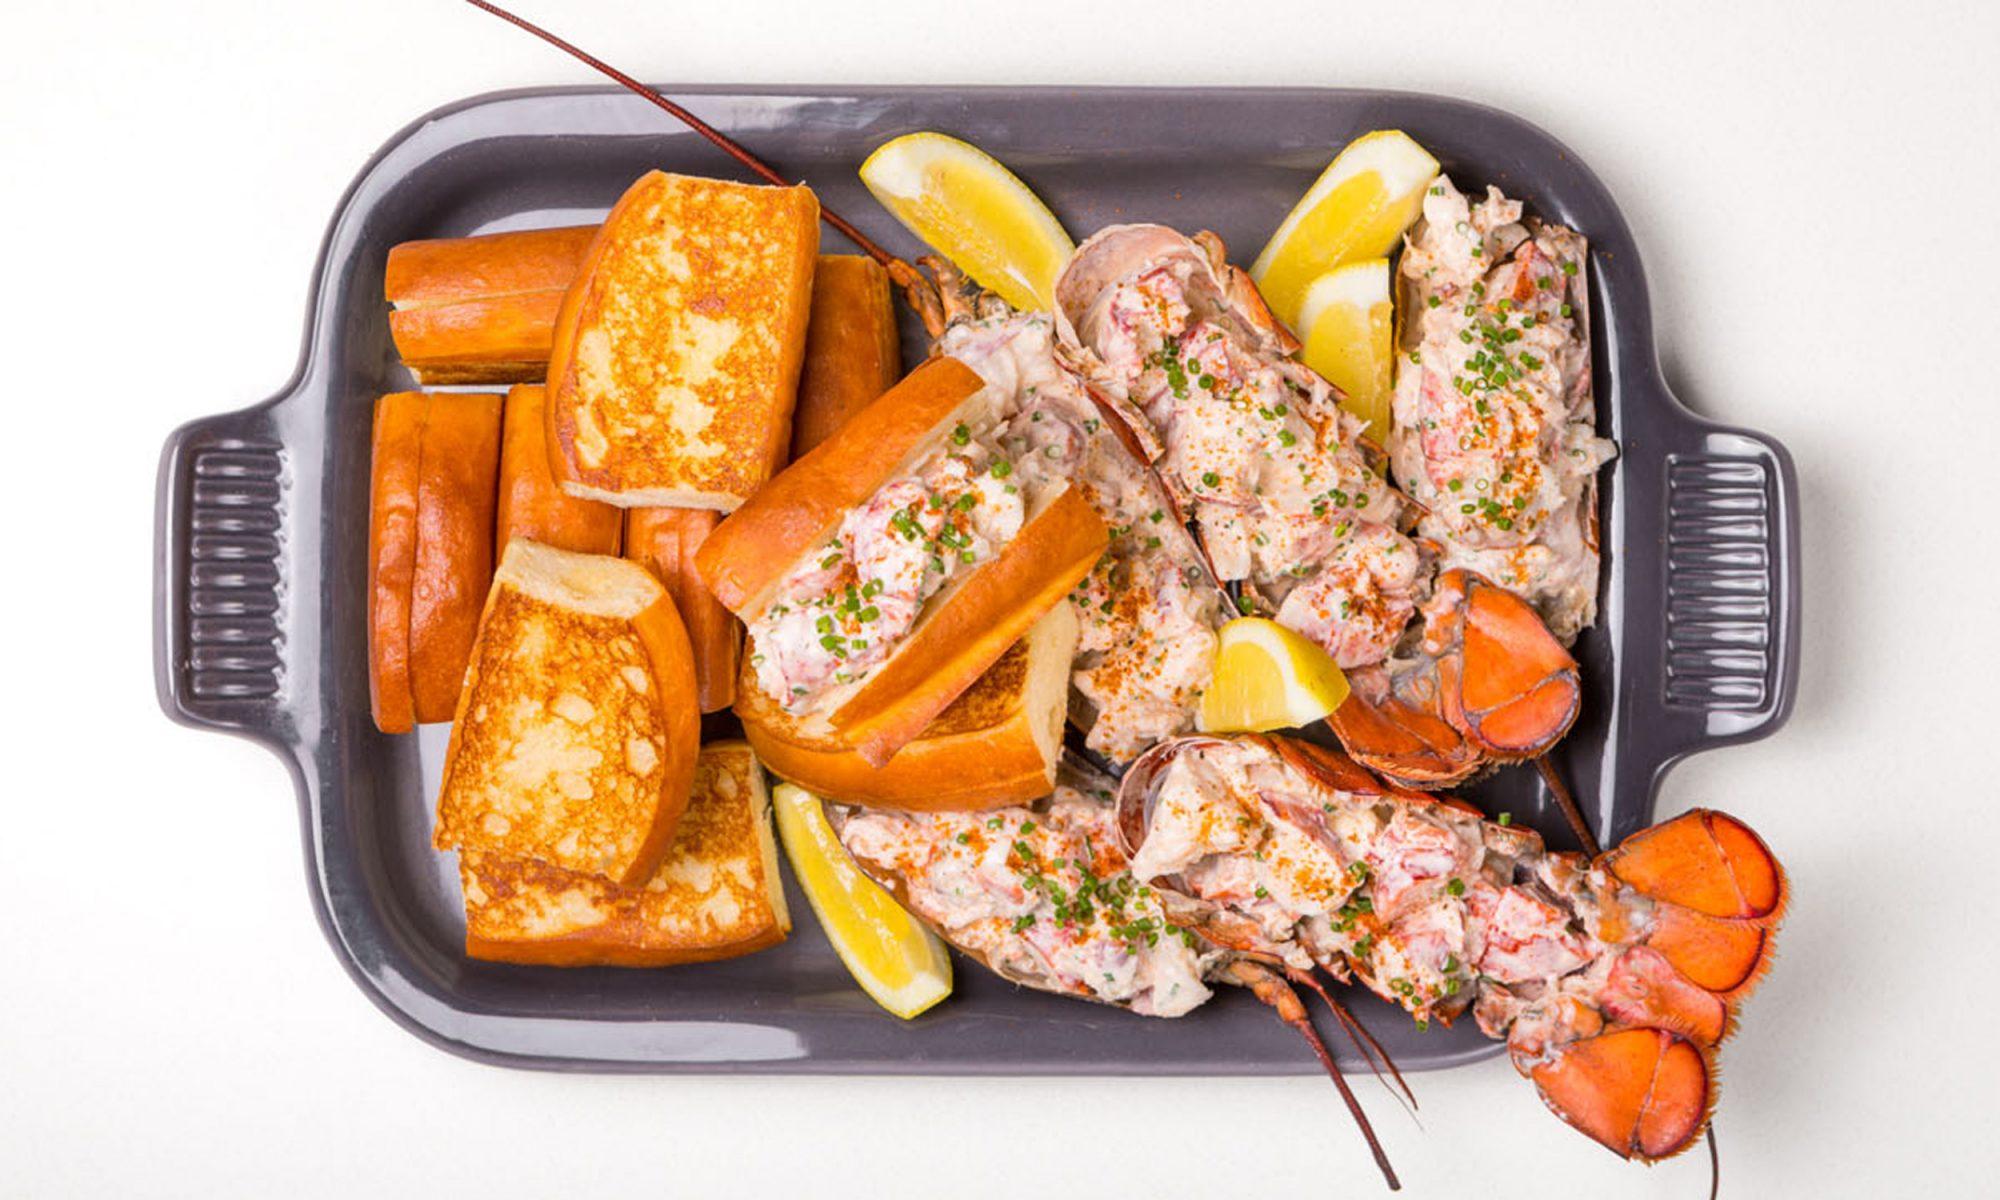 dominique ansel 189 brunch lobster roll